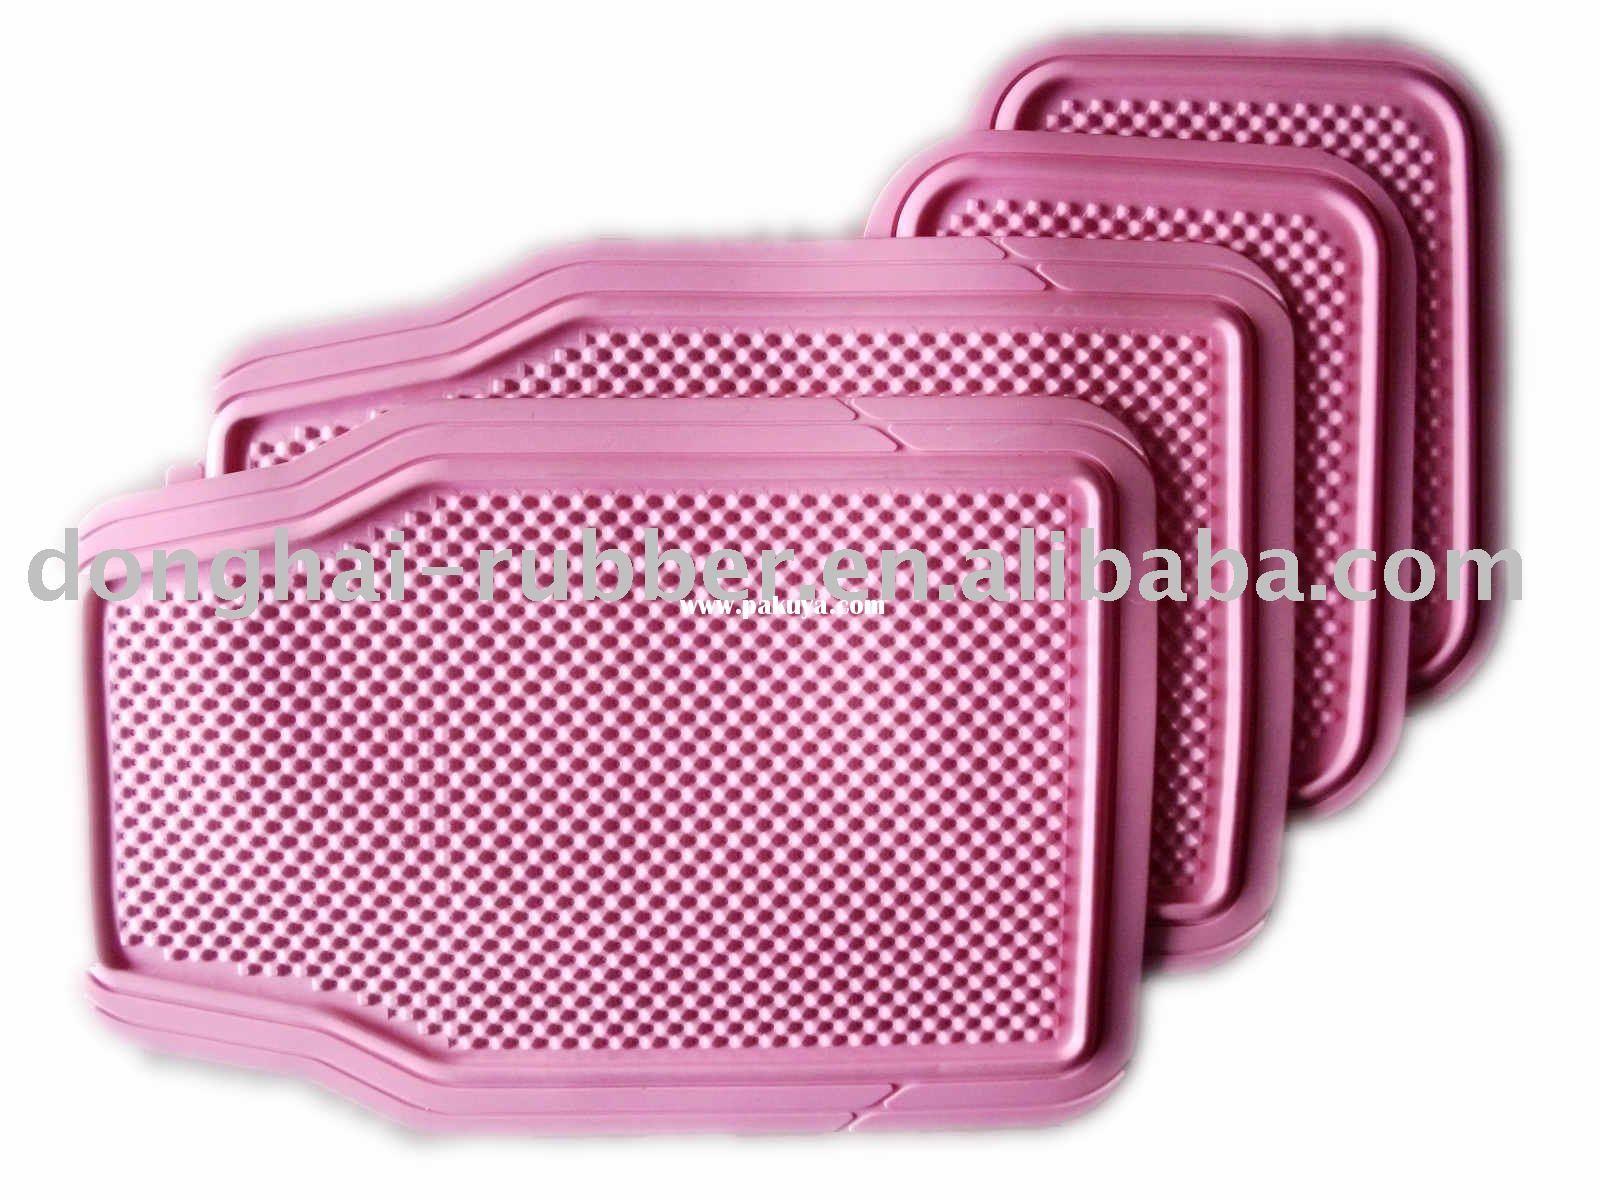 Pink Rubber Car Floor Mats Flooring Ideas and Inspiration